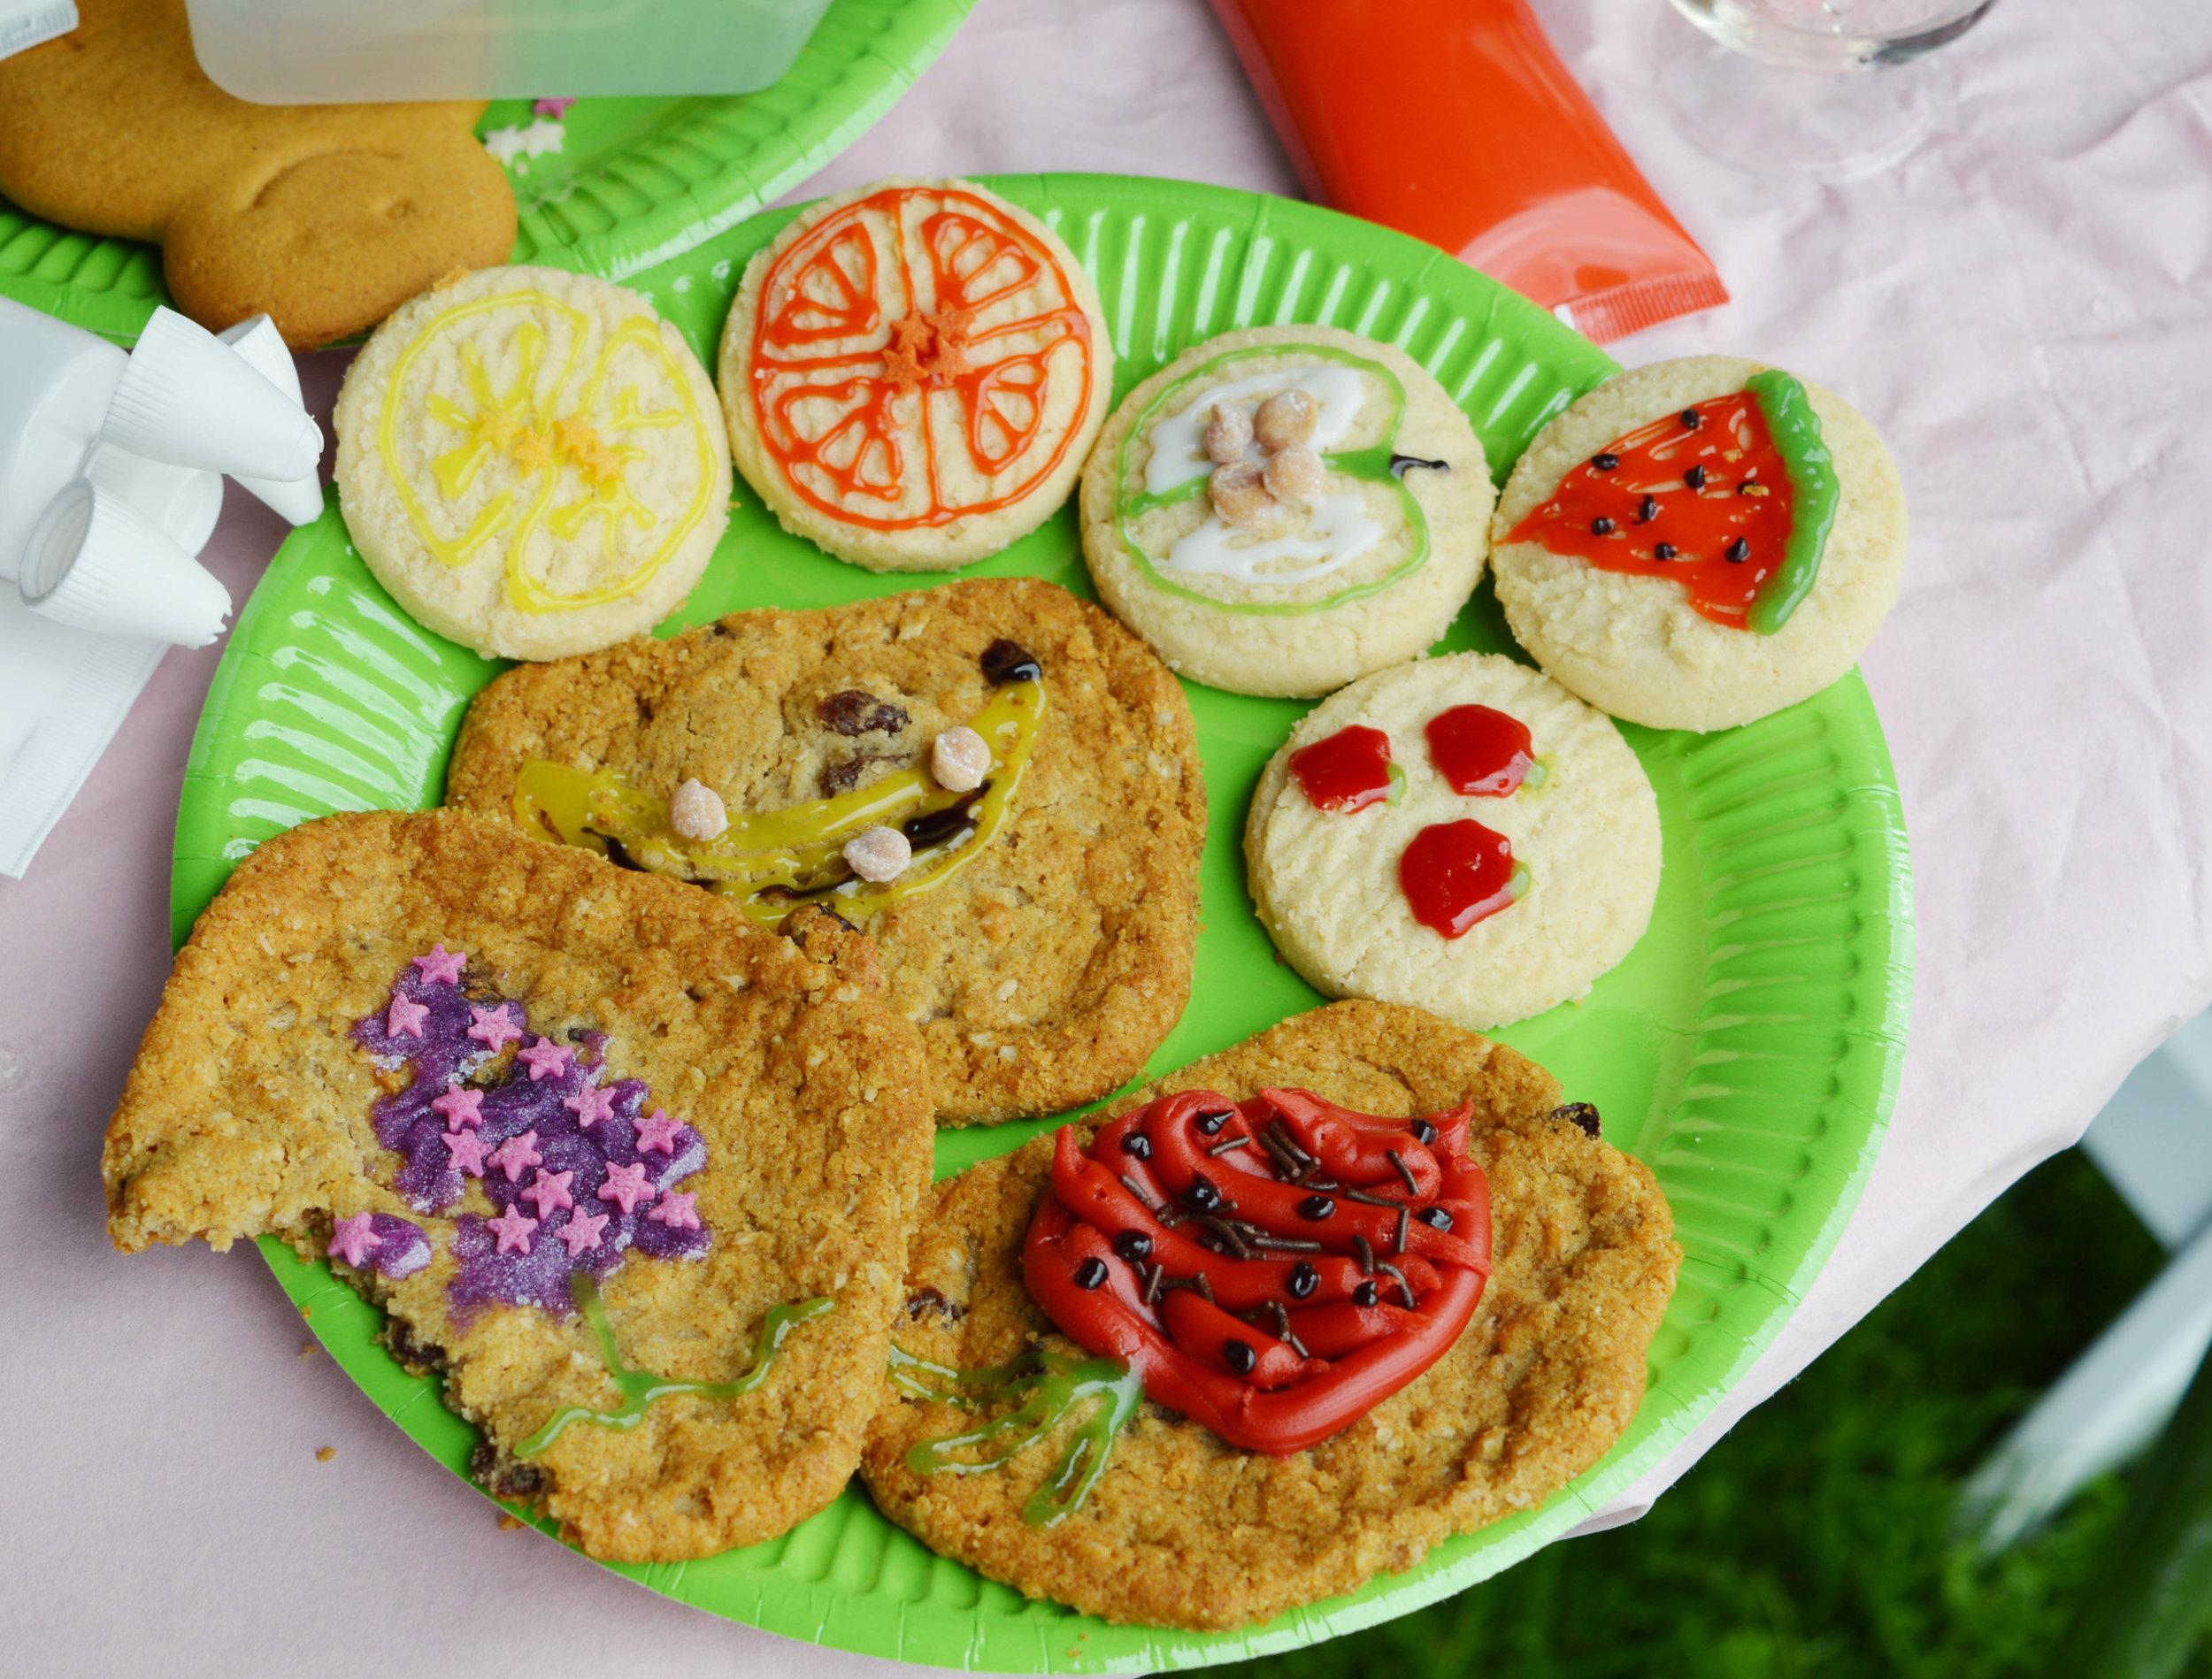 The 10 (Food Festival) Commandments - 10: Thou shalt enter the baking/biscuit decorating/man vs food competition!